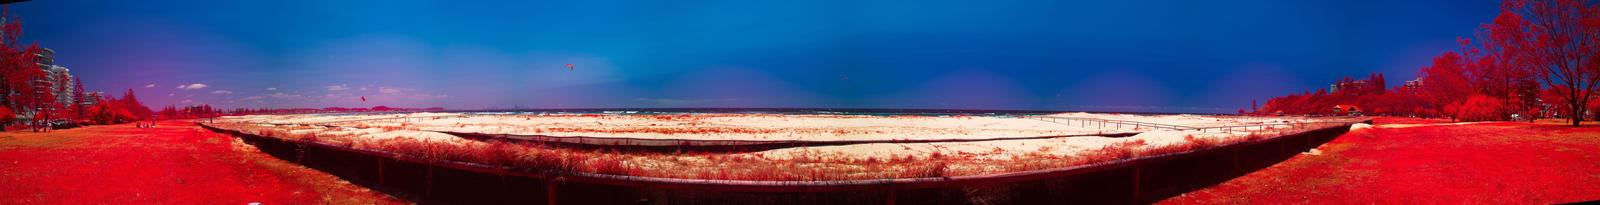 Kirra Beach, Gold Coast, Qld Australia Spring 2013 by colinbm1